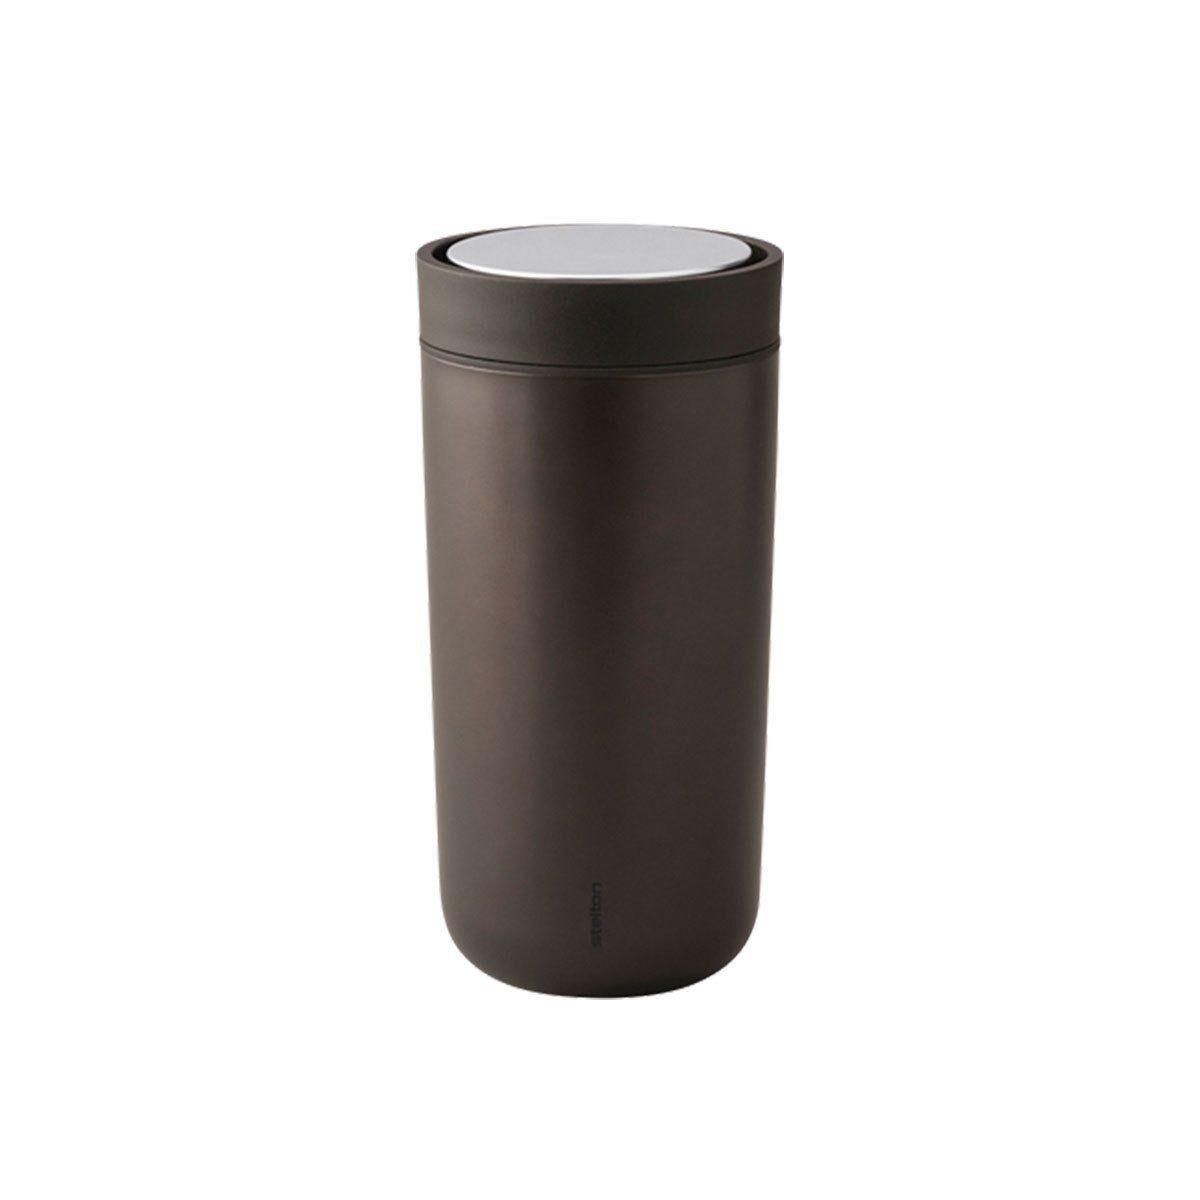 Stelton Stelton Trinkbecher To Go Click 0.2 l, metallic braun